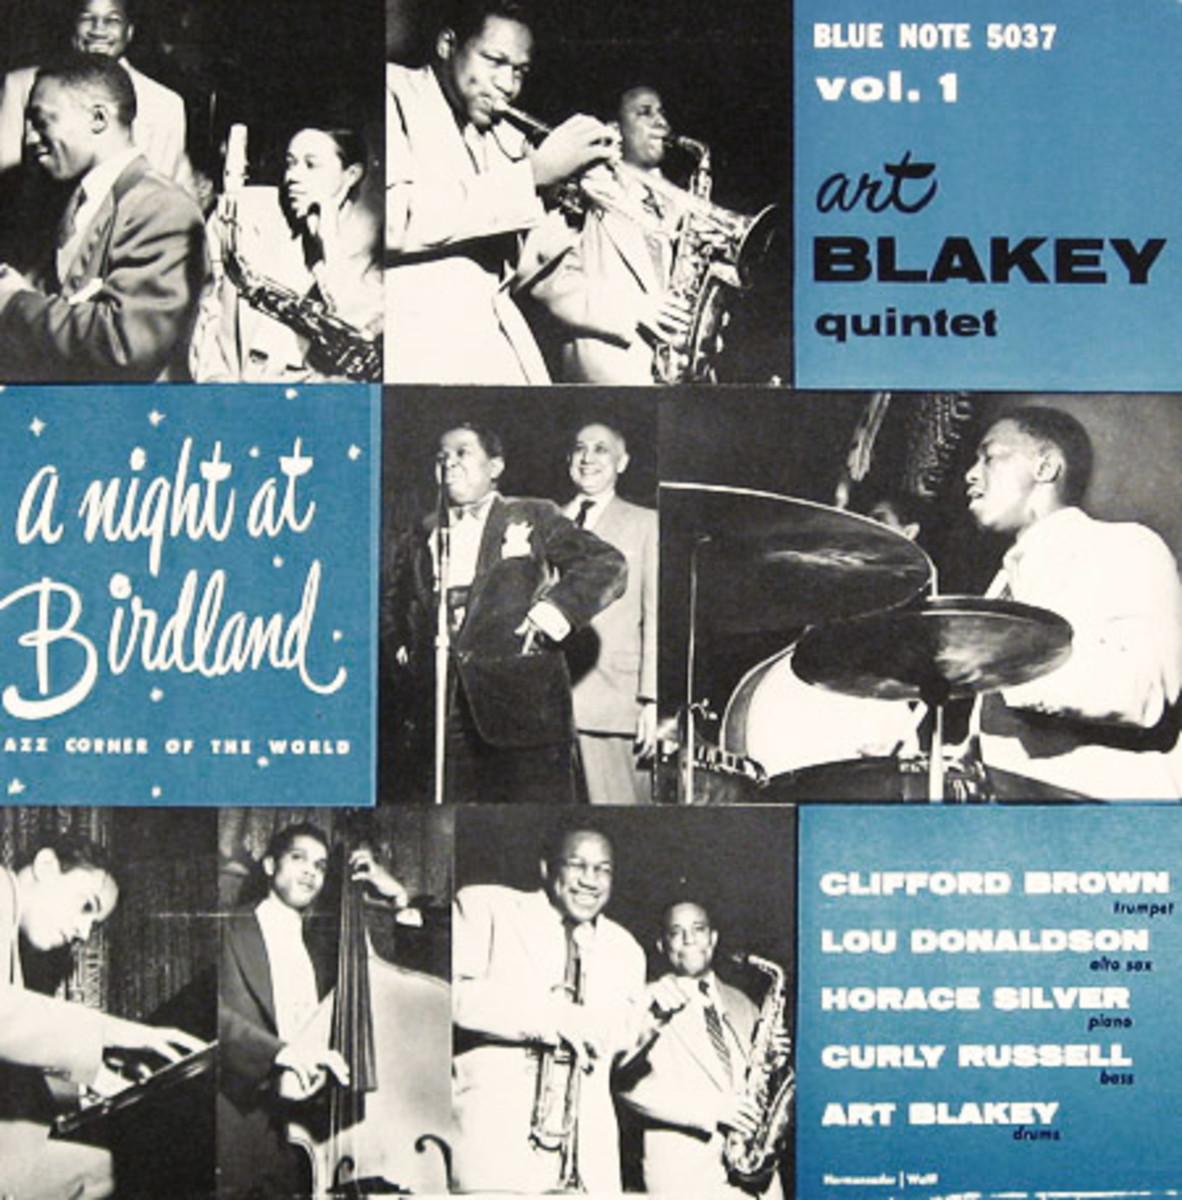 "Art Blakey ""A Night at Birdland, vol. 1"" Blue Note Records 5037 10"" LP Vinyl Microgroove Record (1954) Album Cover Design by John Hermansader, Photos by Francis Wolff"